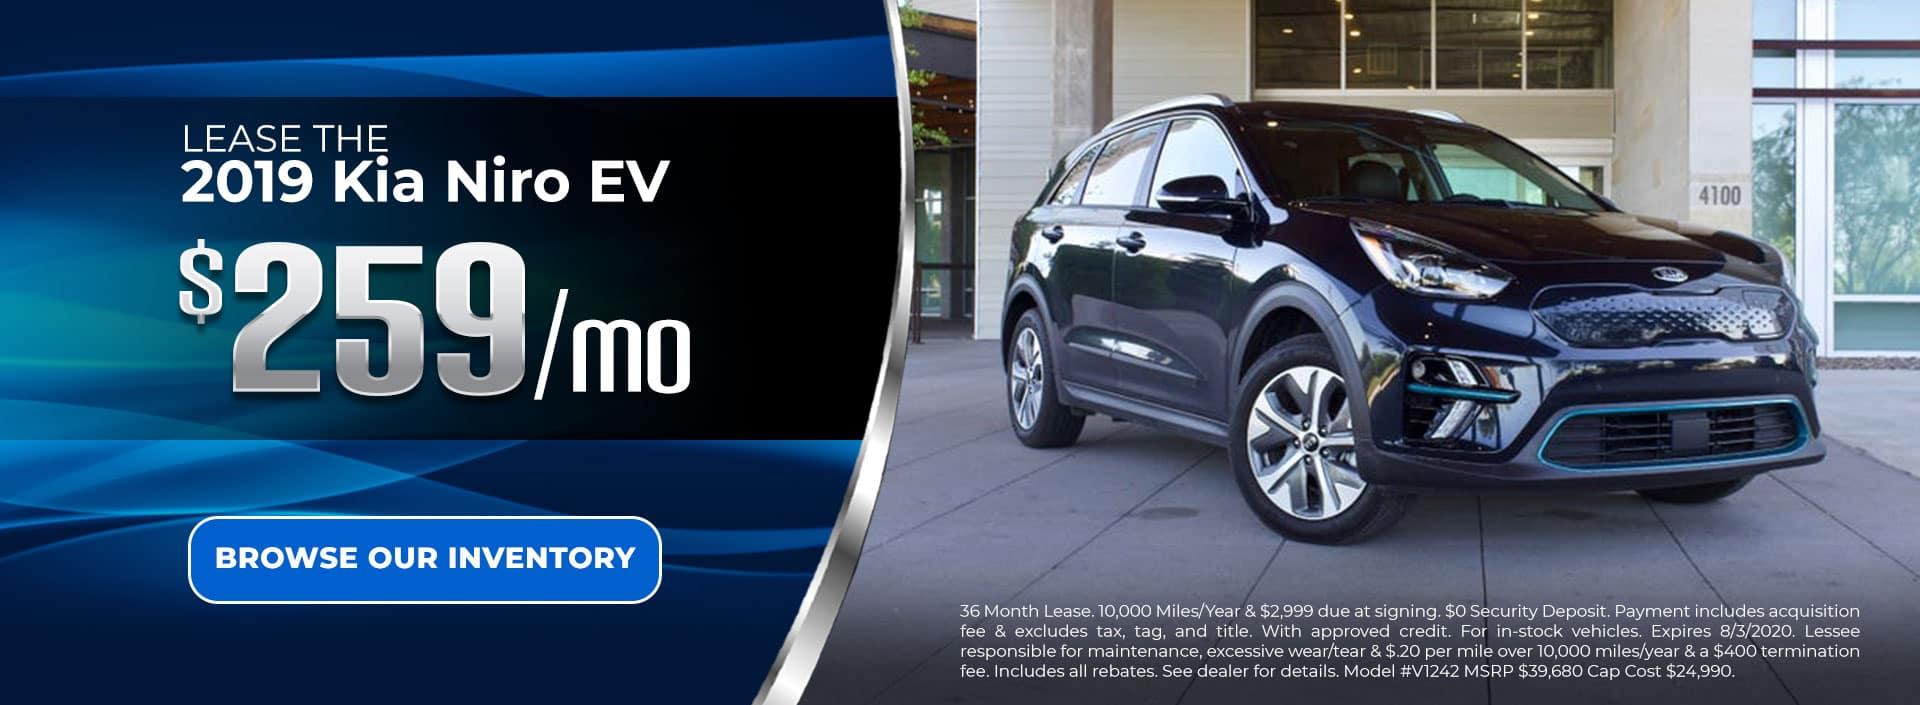 Lease 2019 Niro EV for $259/mo